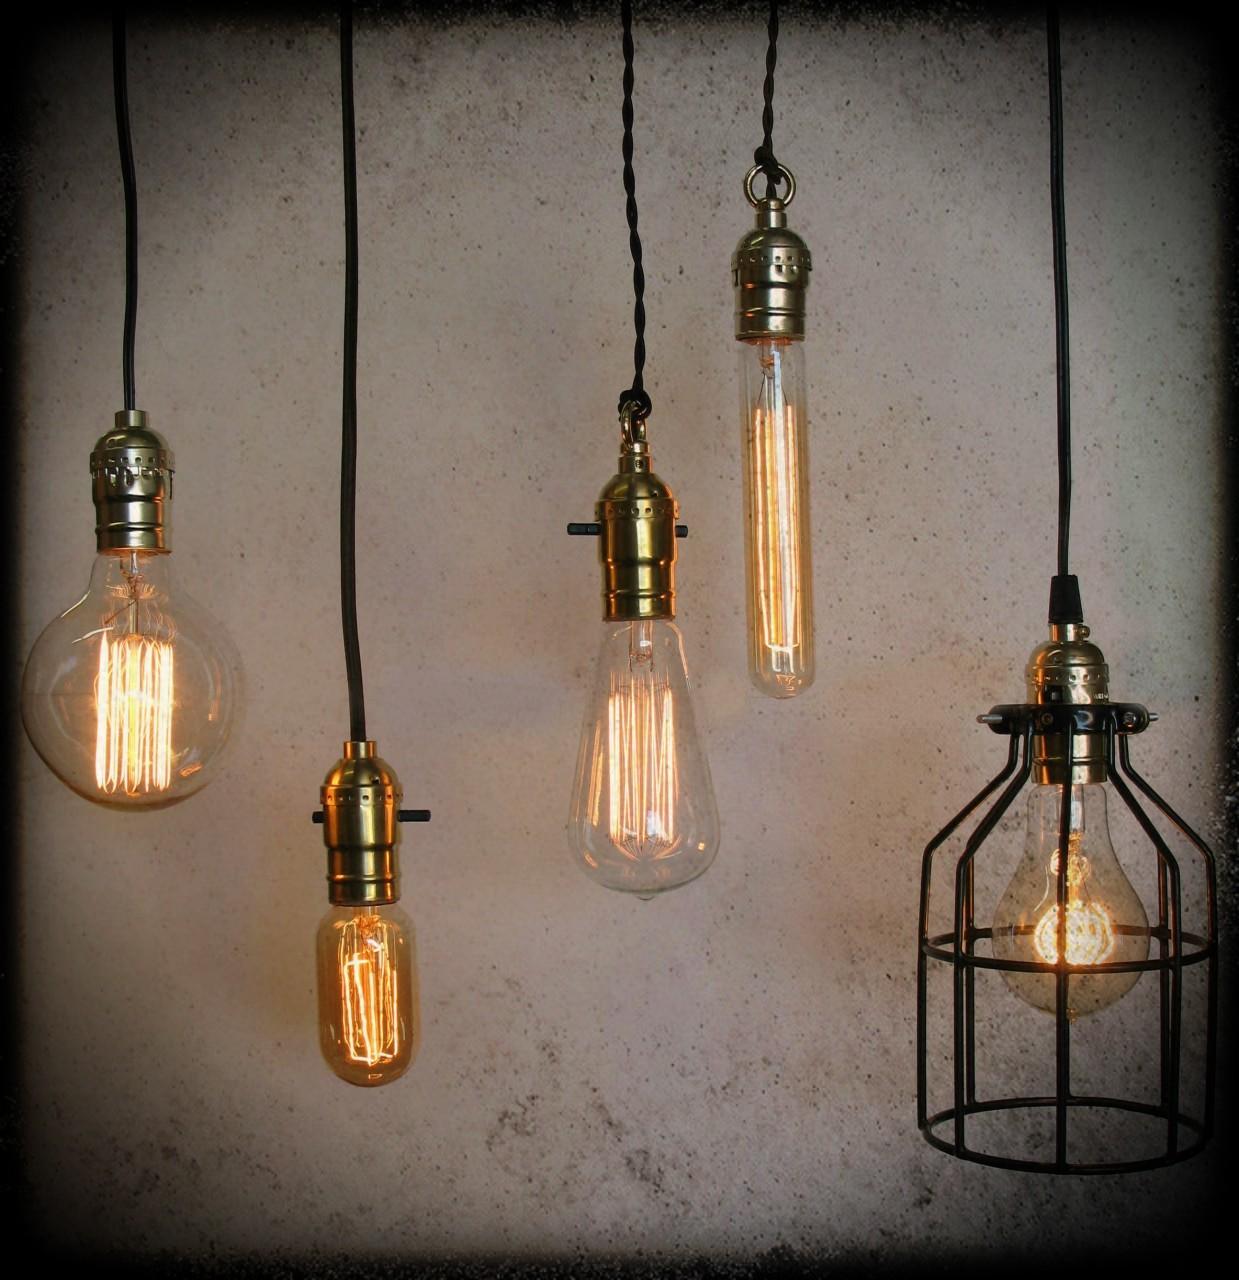 Design Your Own Edison Antique Pendent Lamp